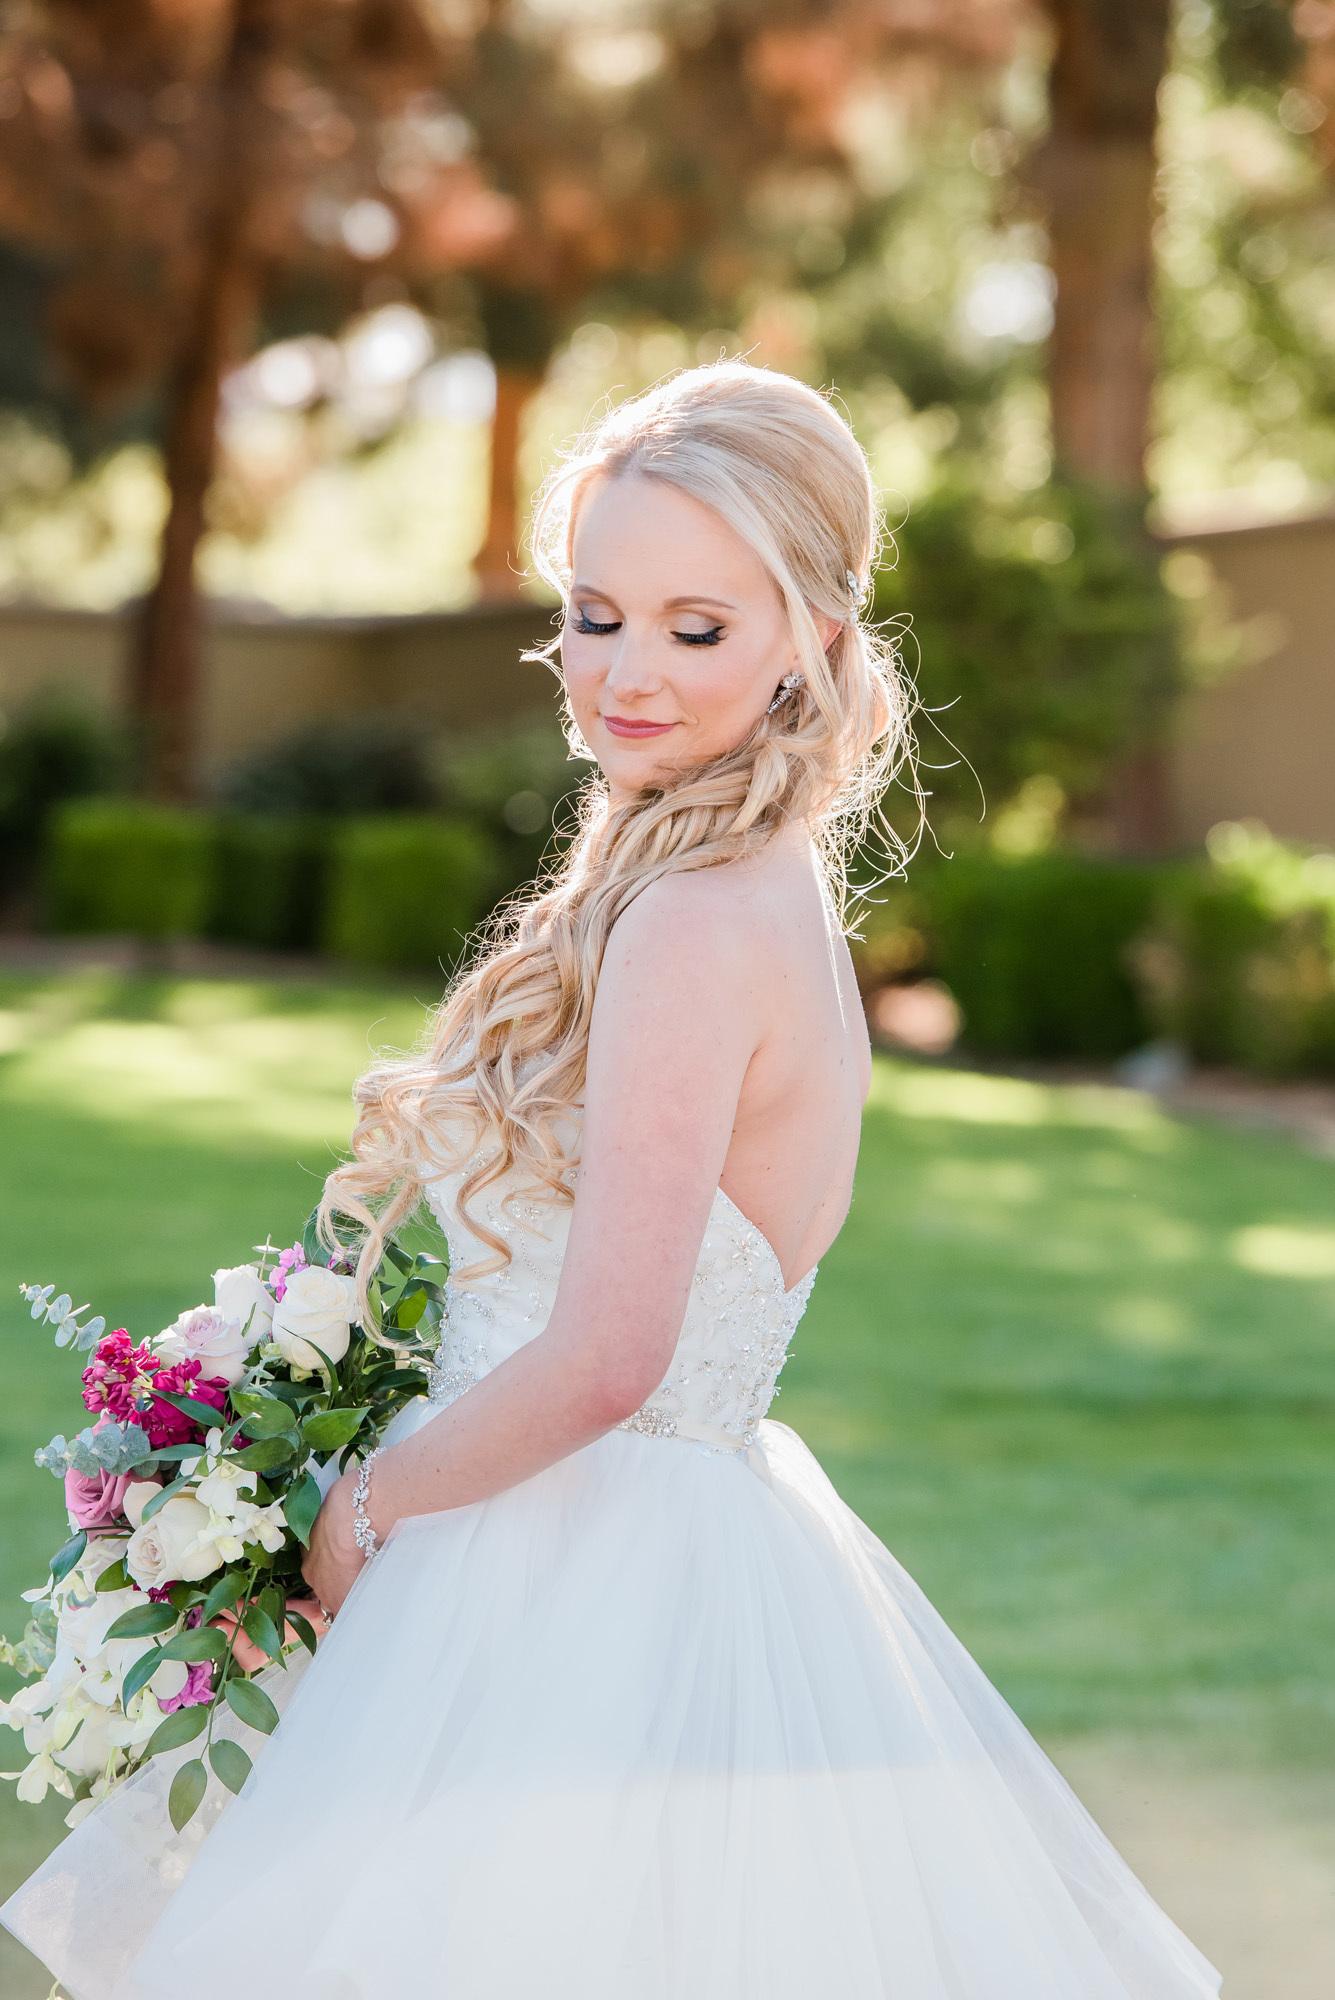 Soft wedding makeup